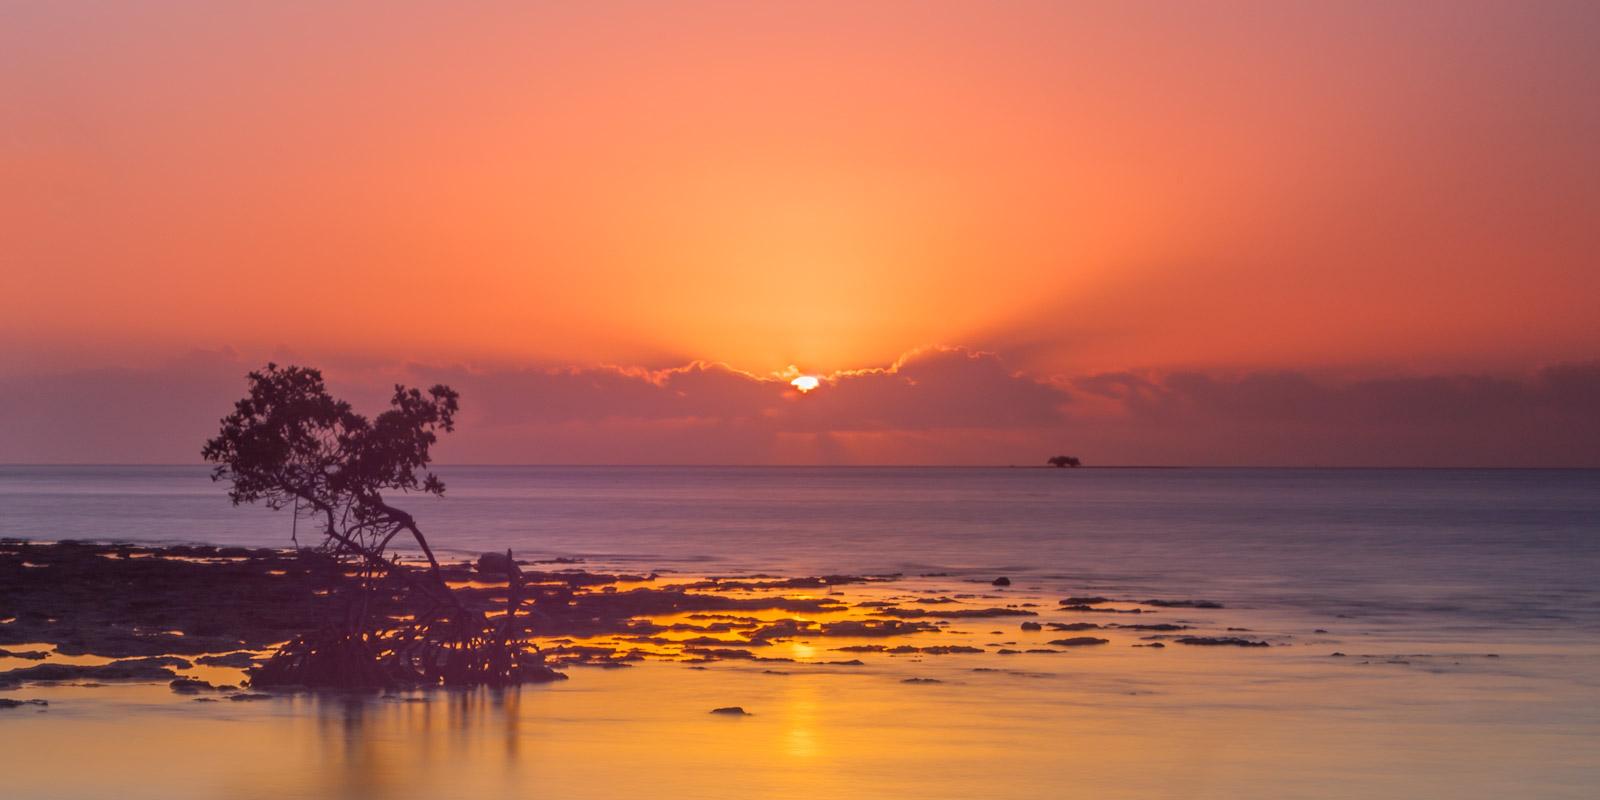 Florida, Big Pine, sunrise, ocean, mangrove, limited edition, photograph, fine art, landscape, coast, photo